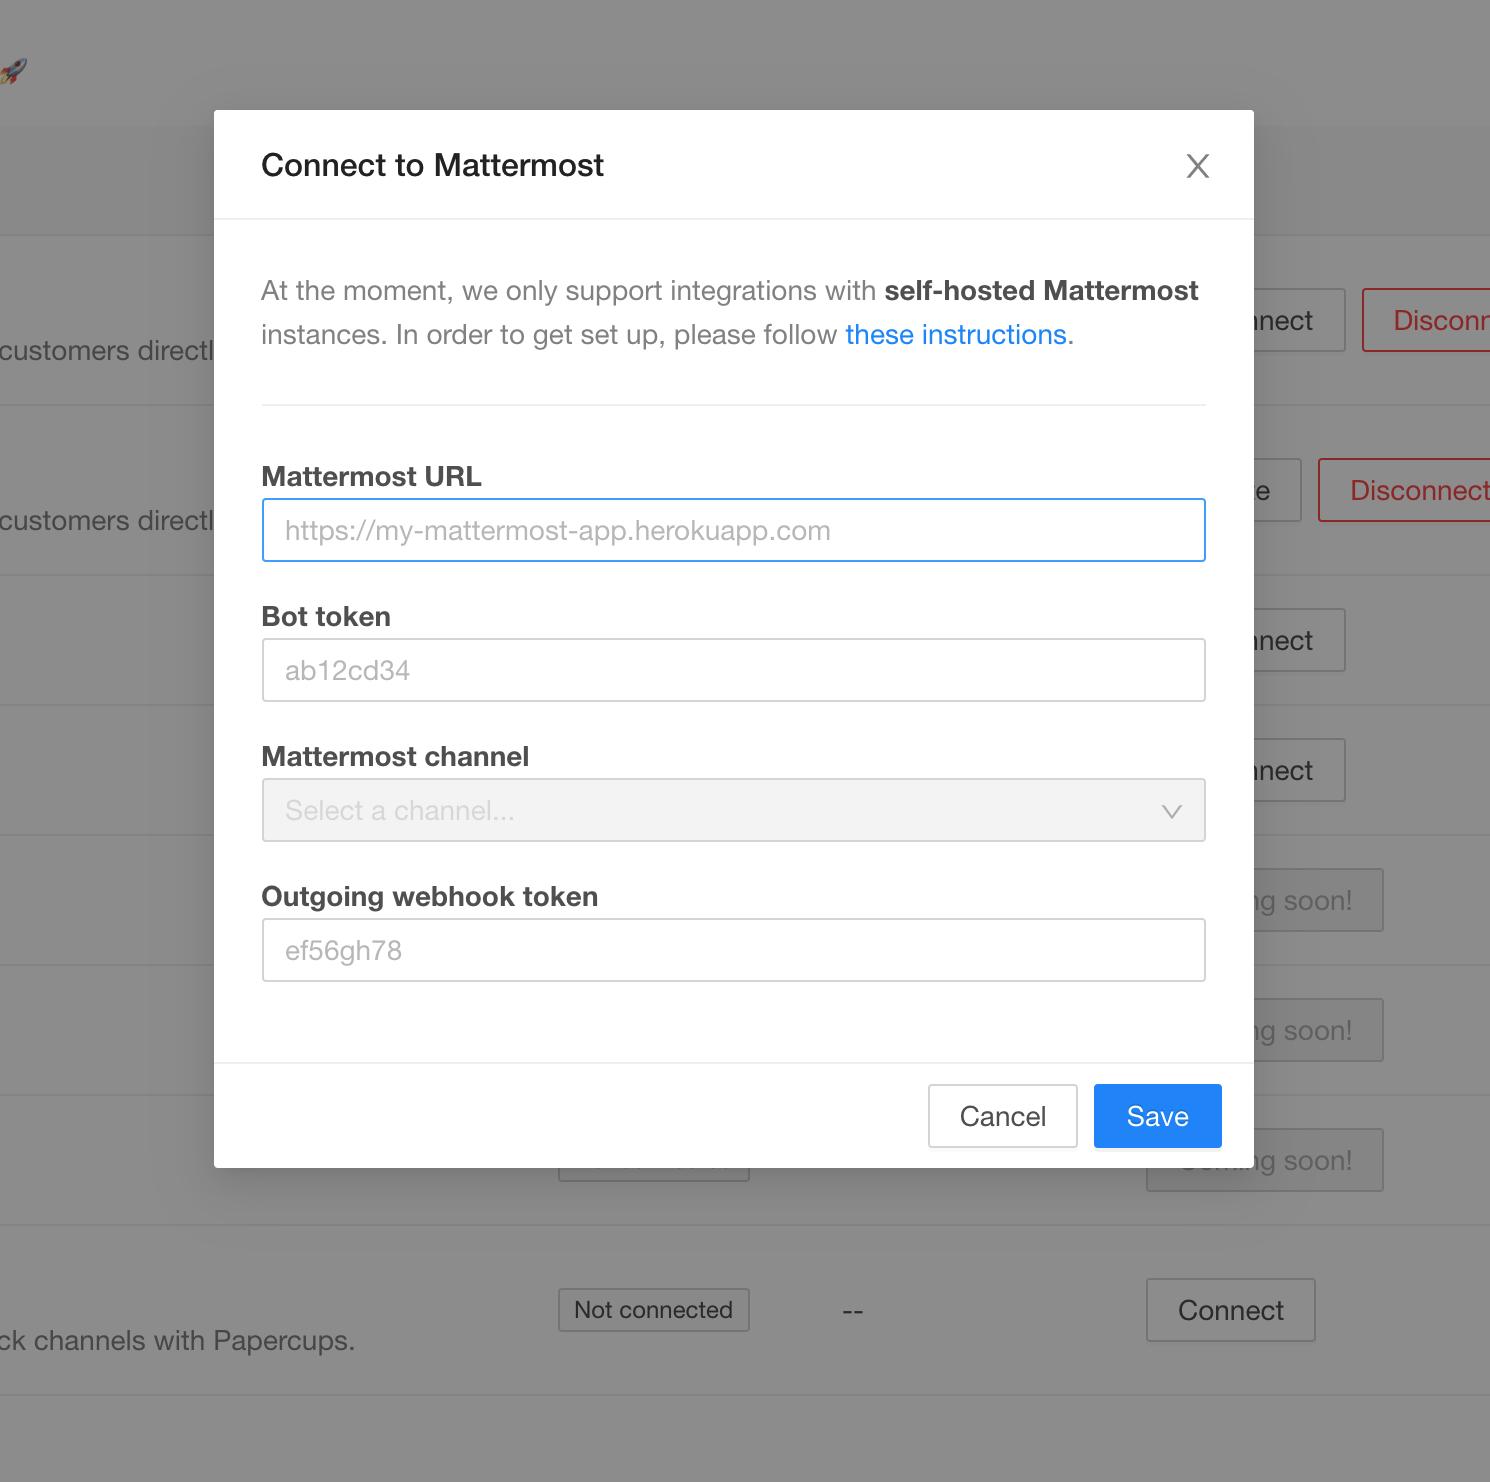 Mattermost authorization modal